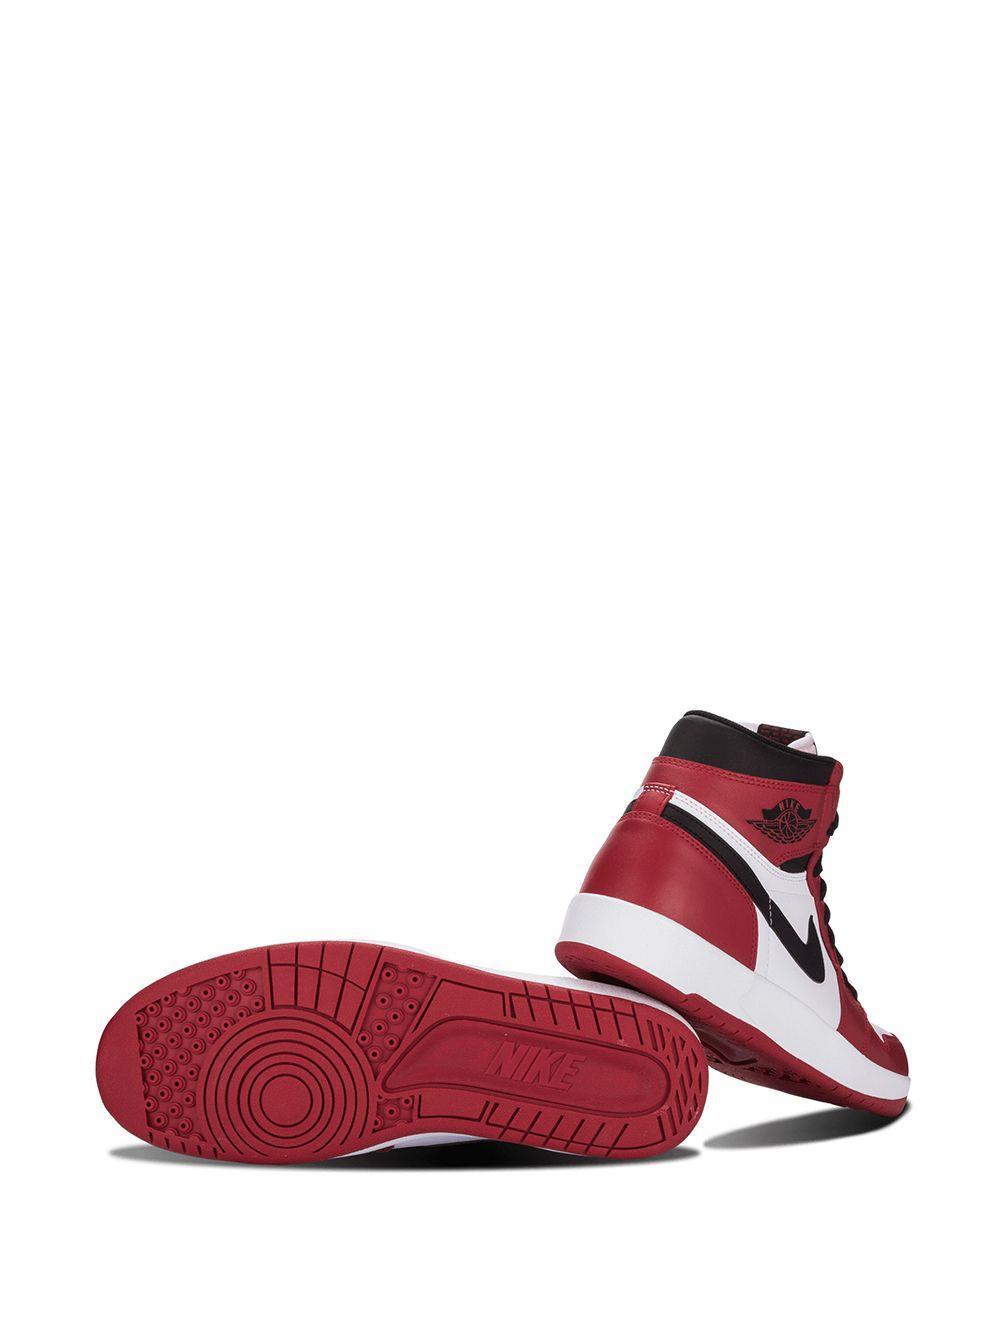 Nike Rubber Air 1.5 High The Return Sneakers in het Rood voor heren